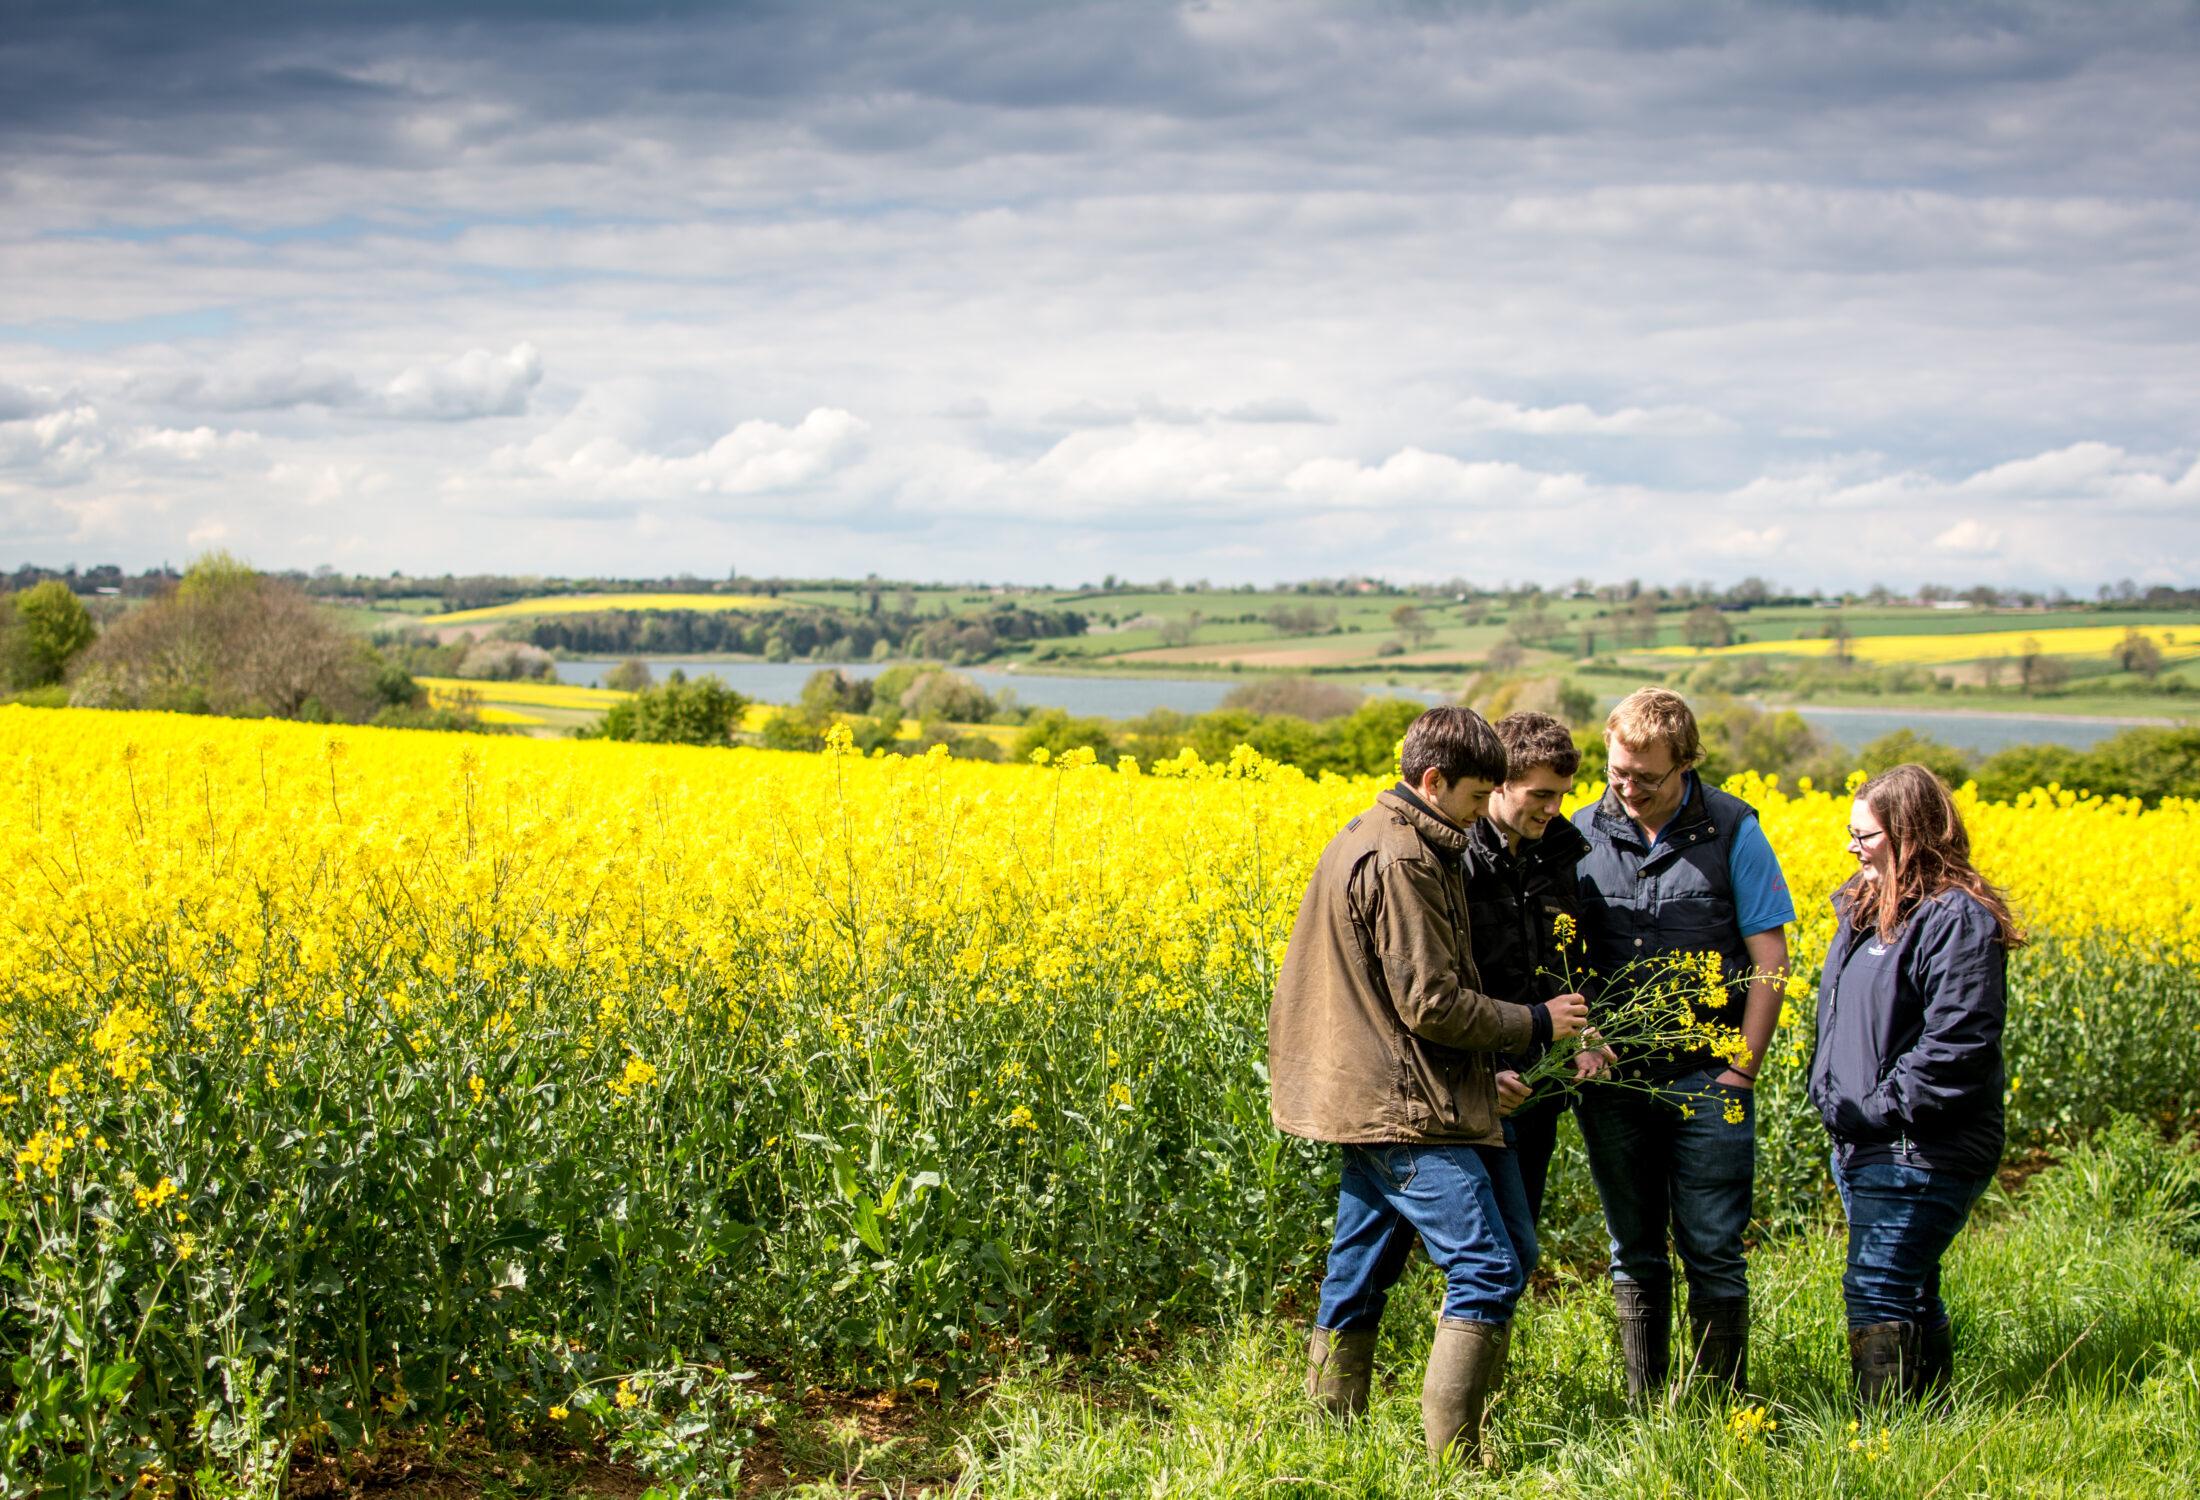 Students in field examining crop